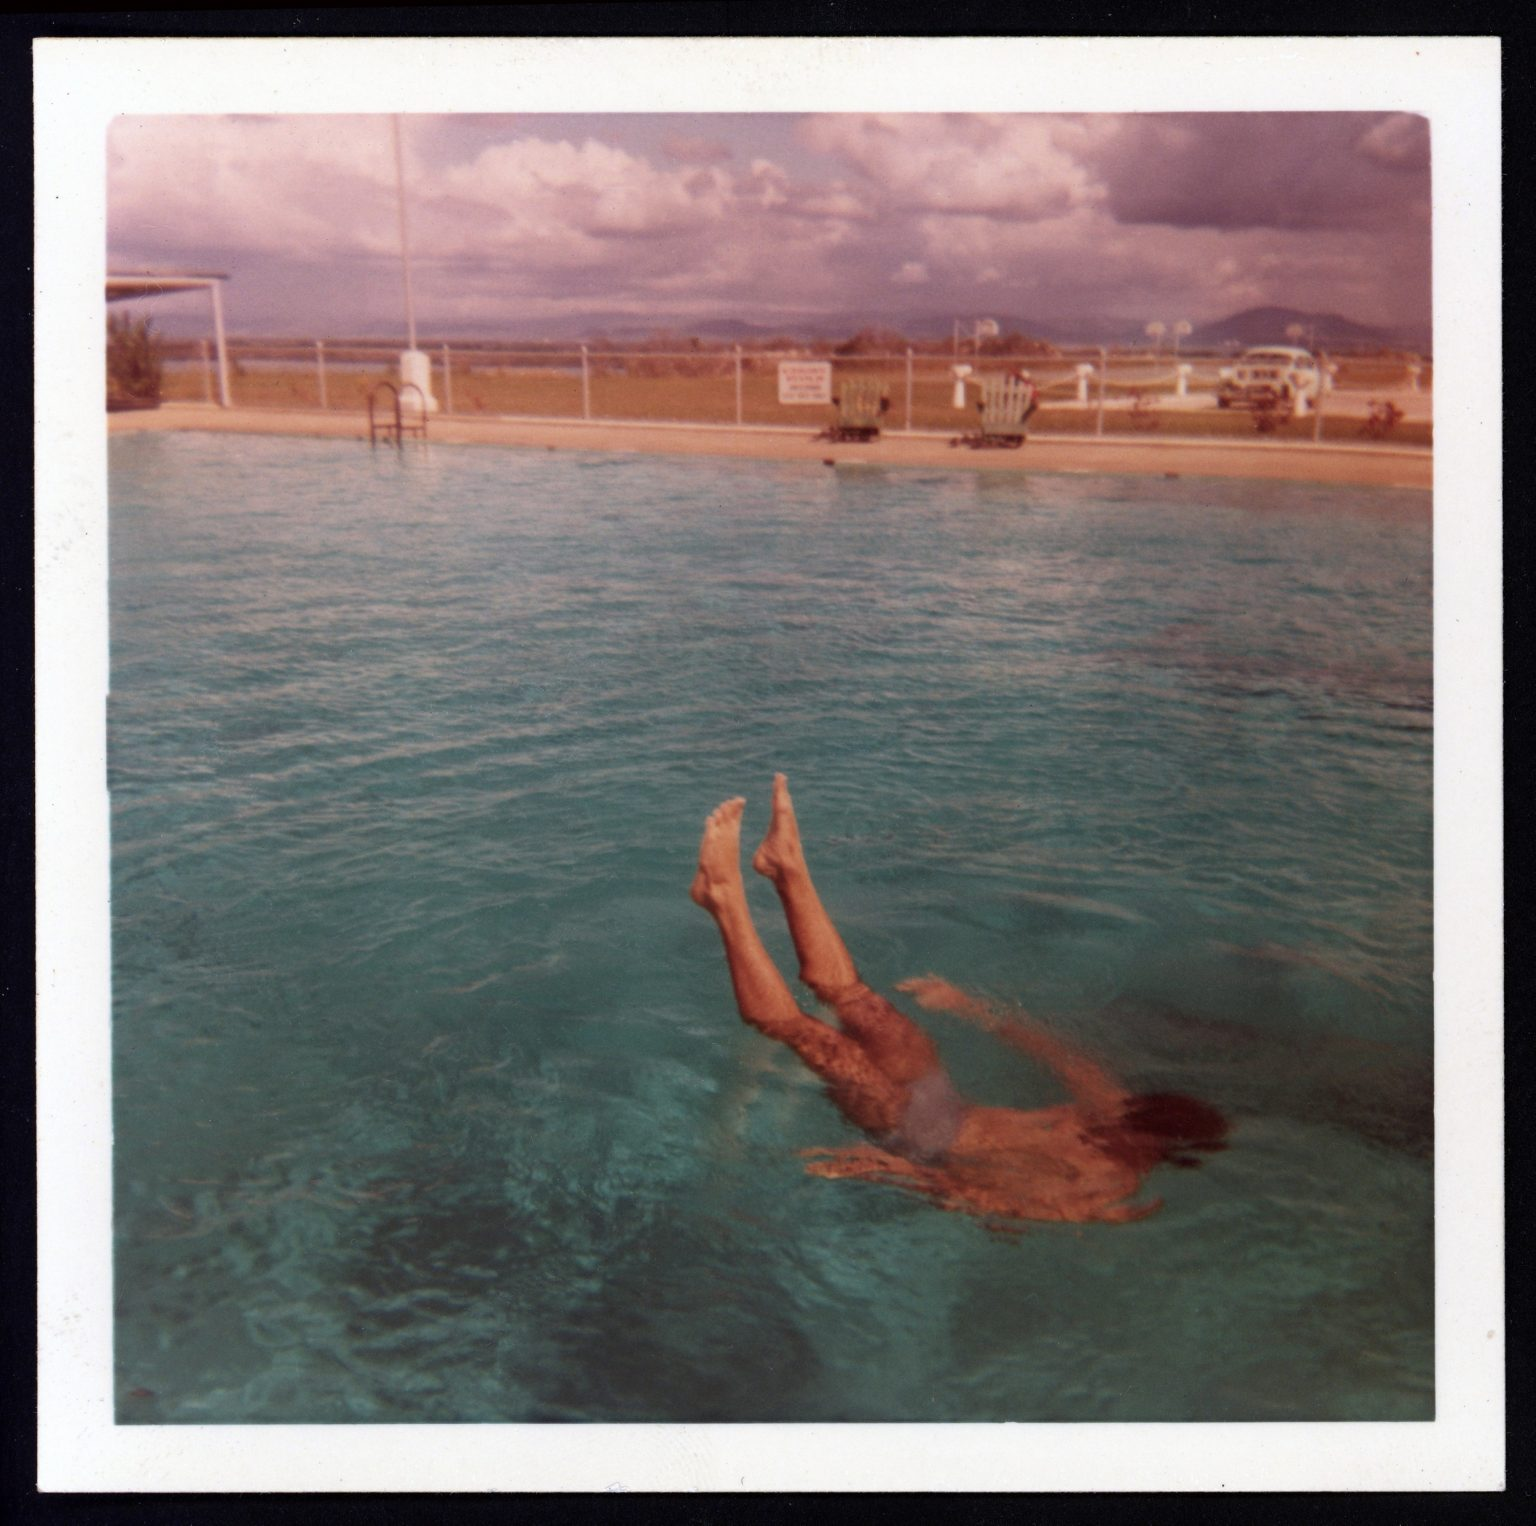 1970-s-usa-swimming-pool